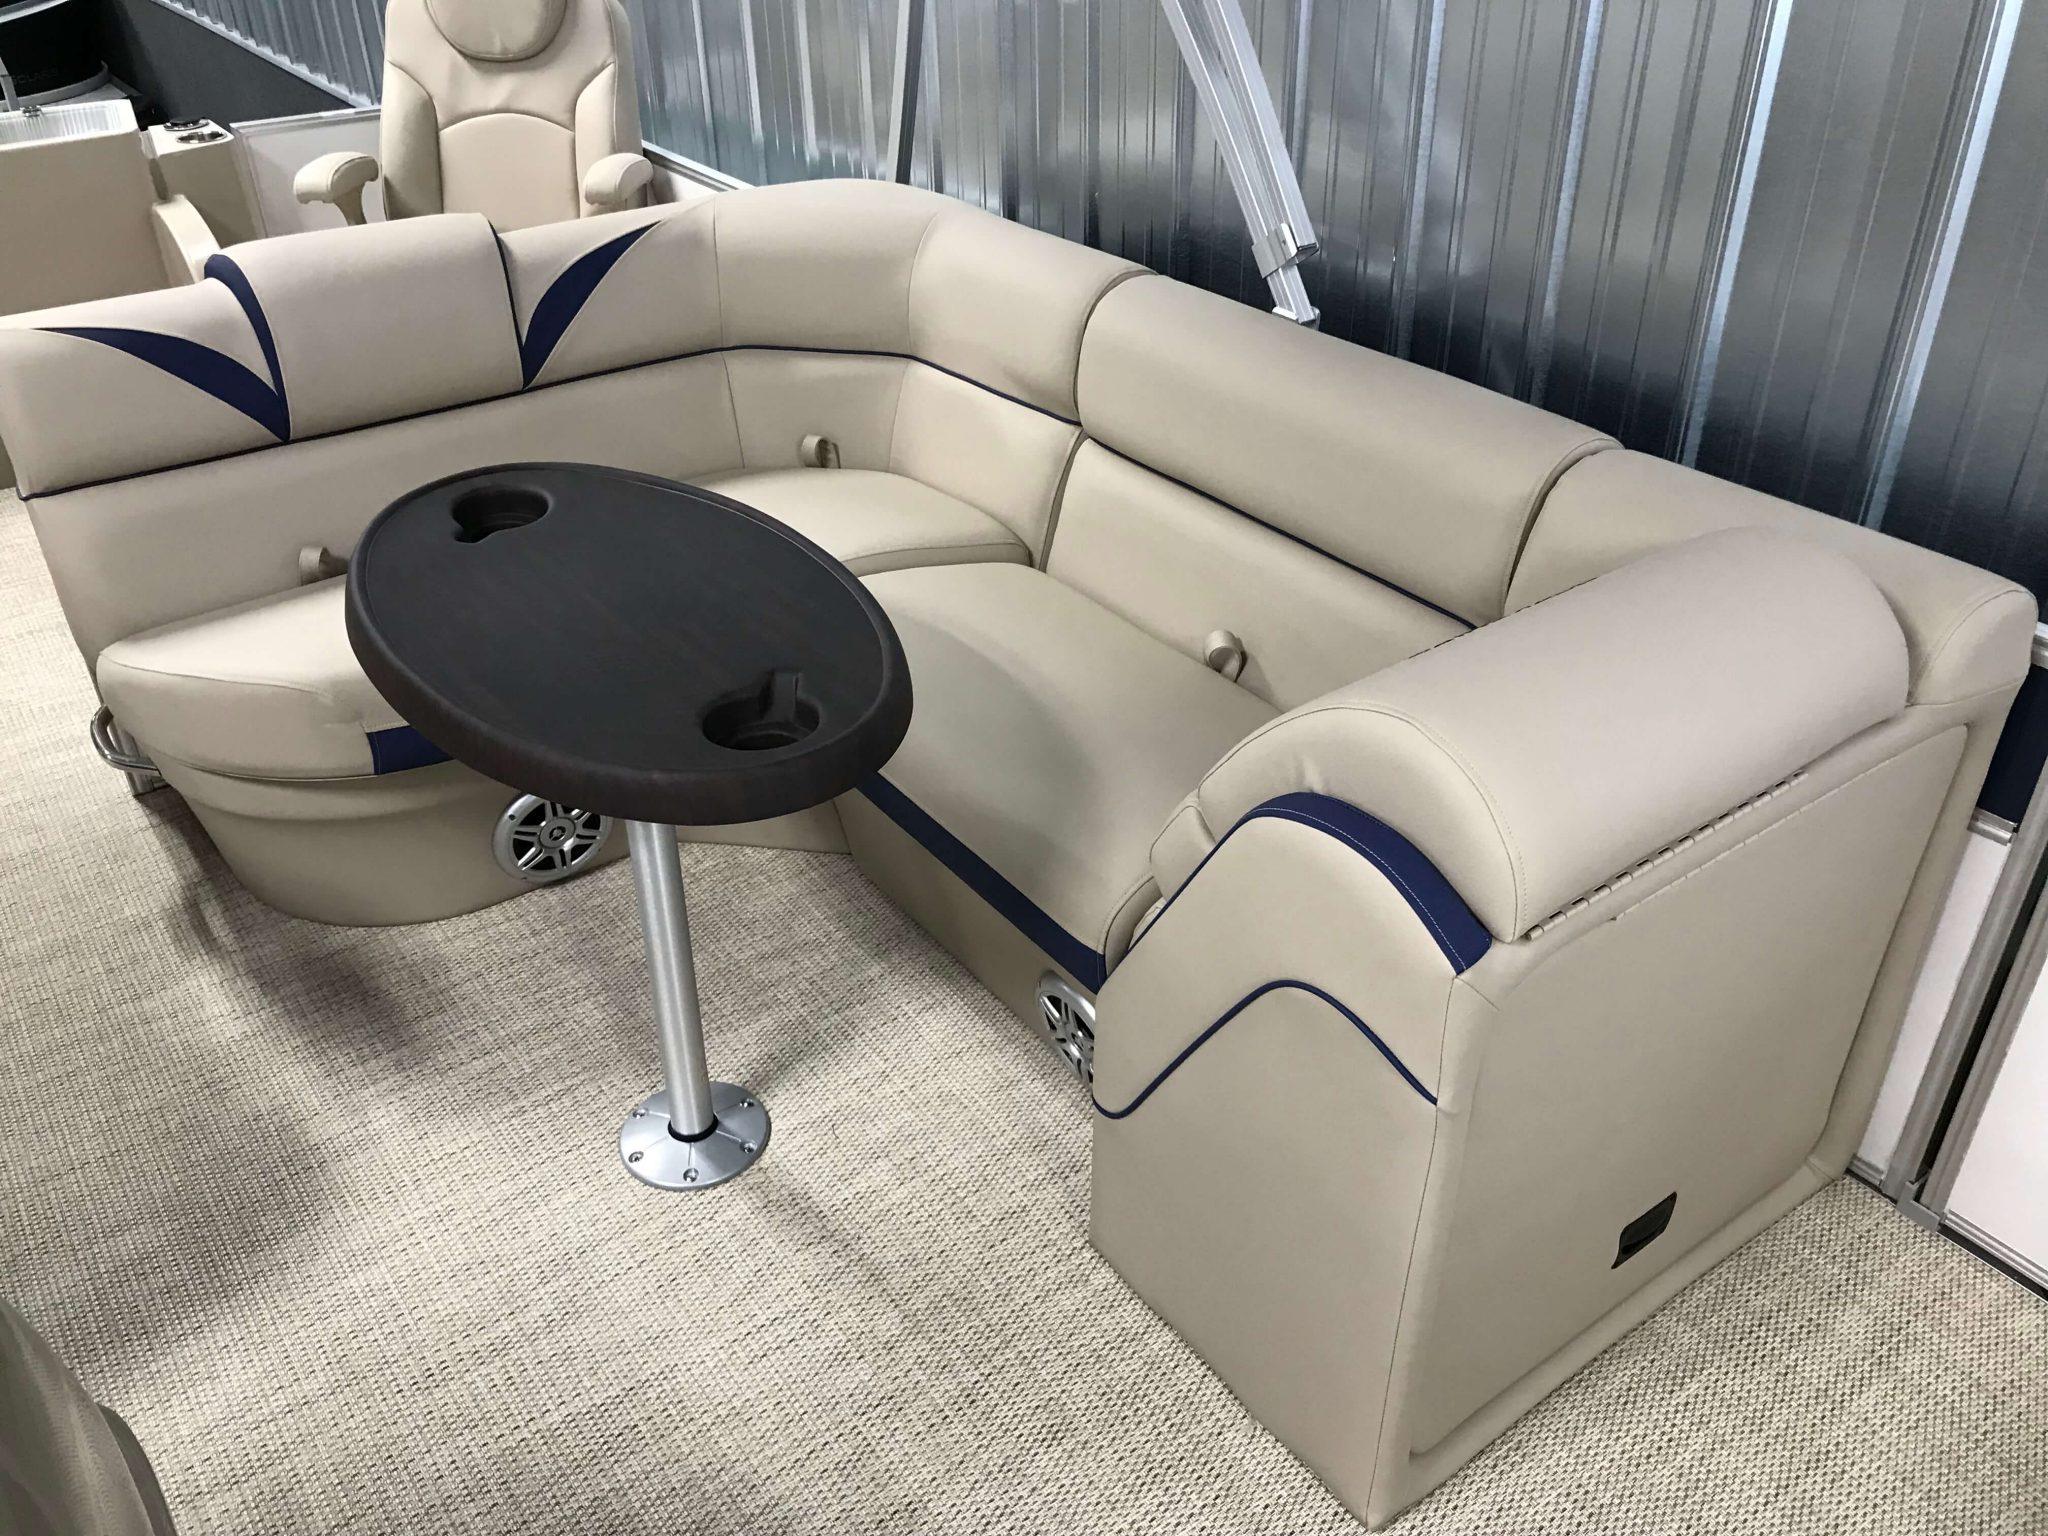 2019 Berkshire 23RFC2 STS Deluxe Pontoon Interior Cockpit Seating 1